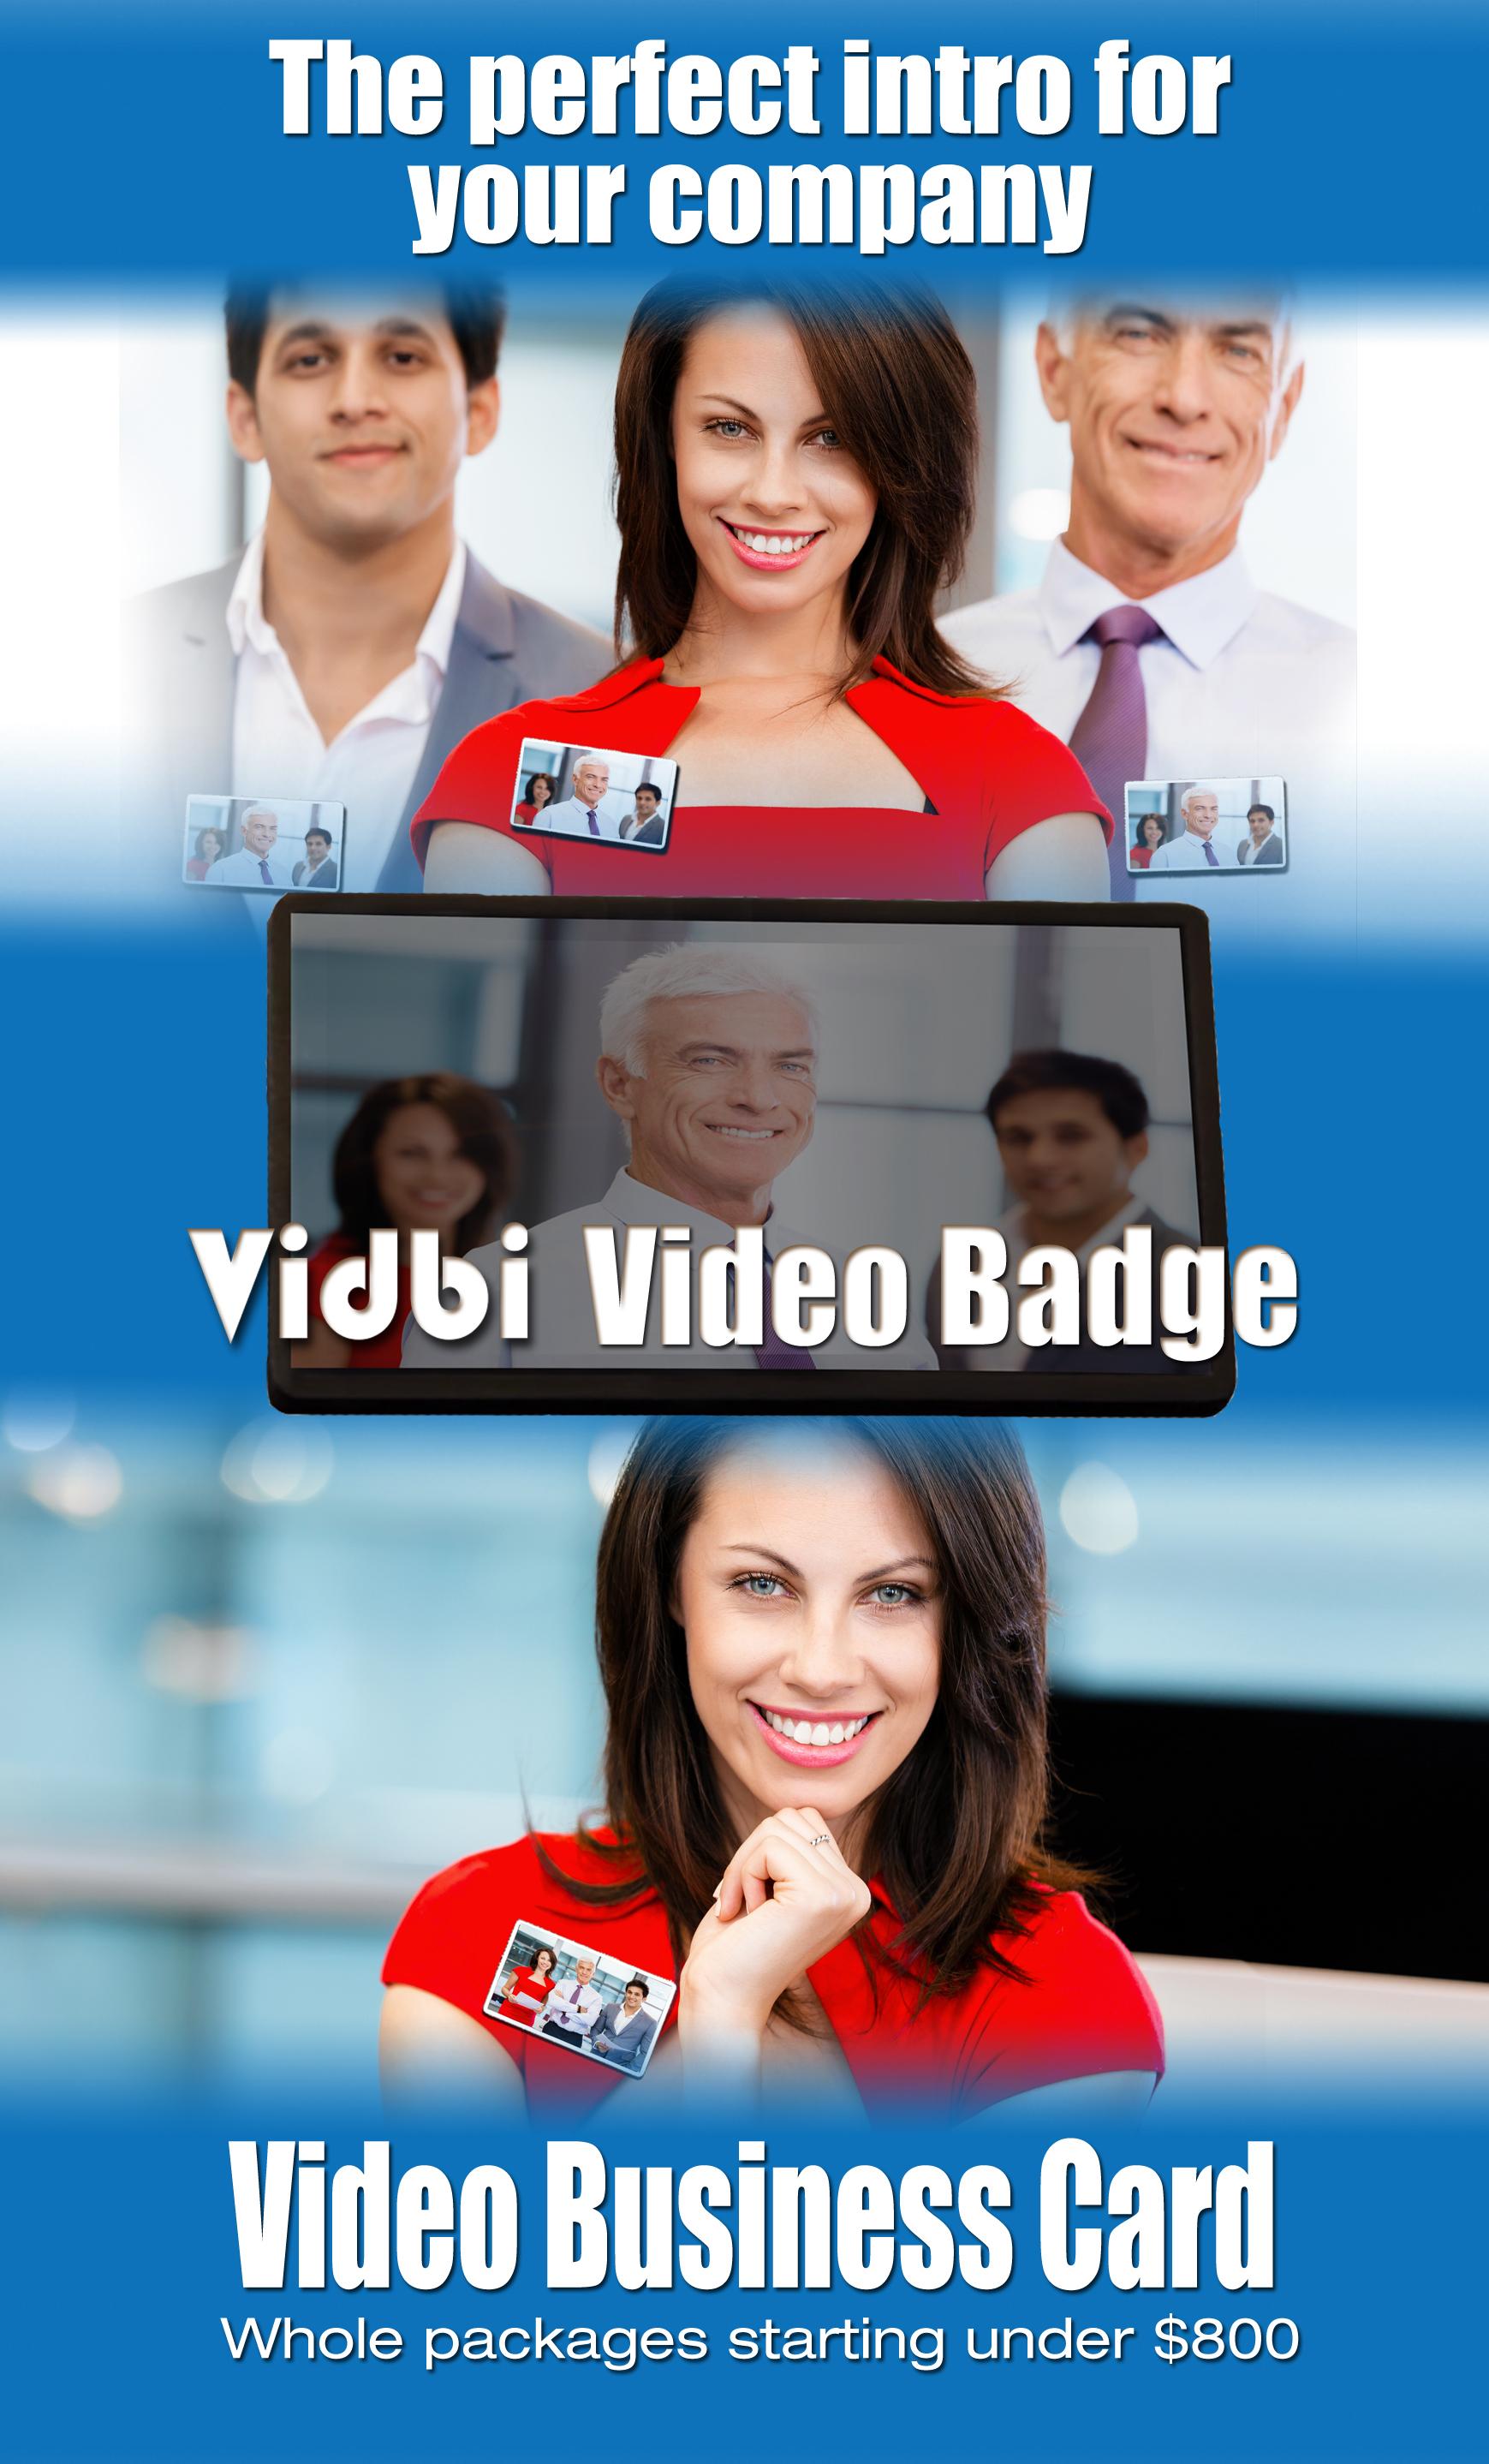 Vidbi Ad